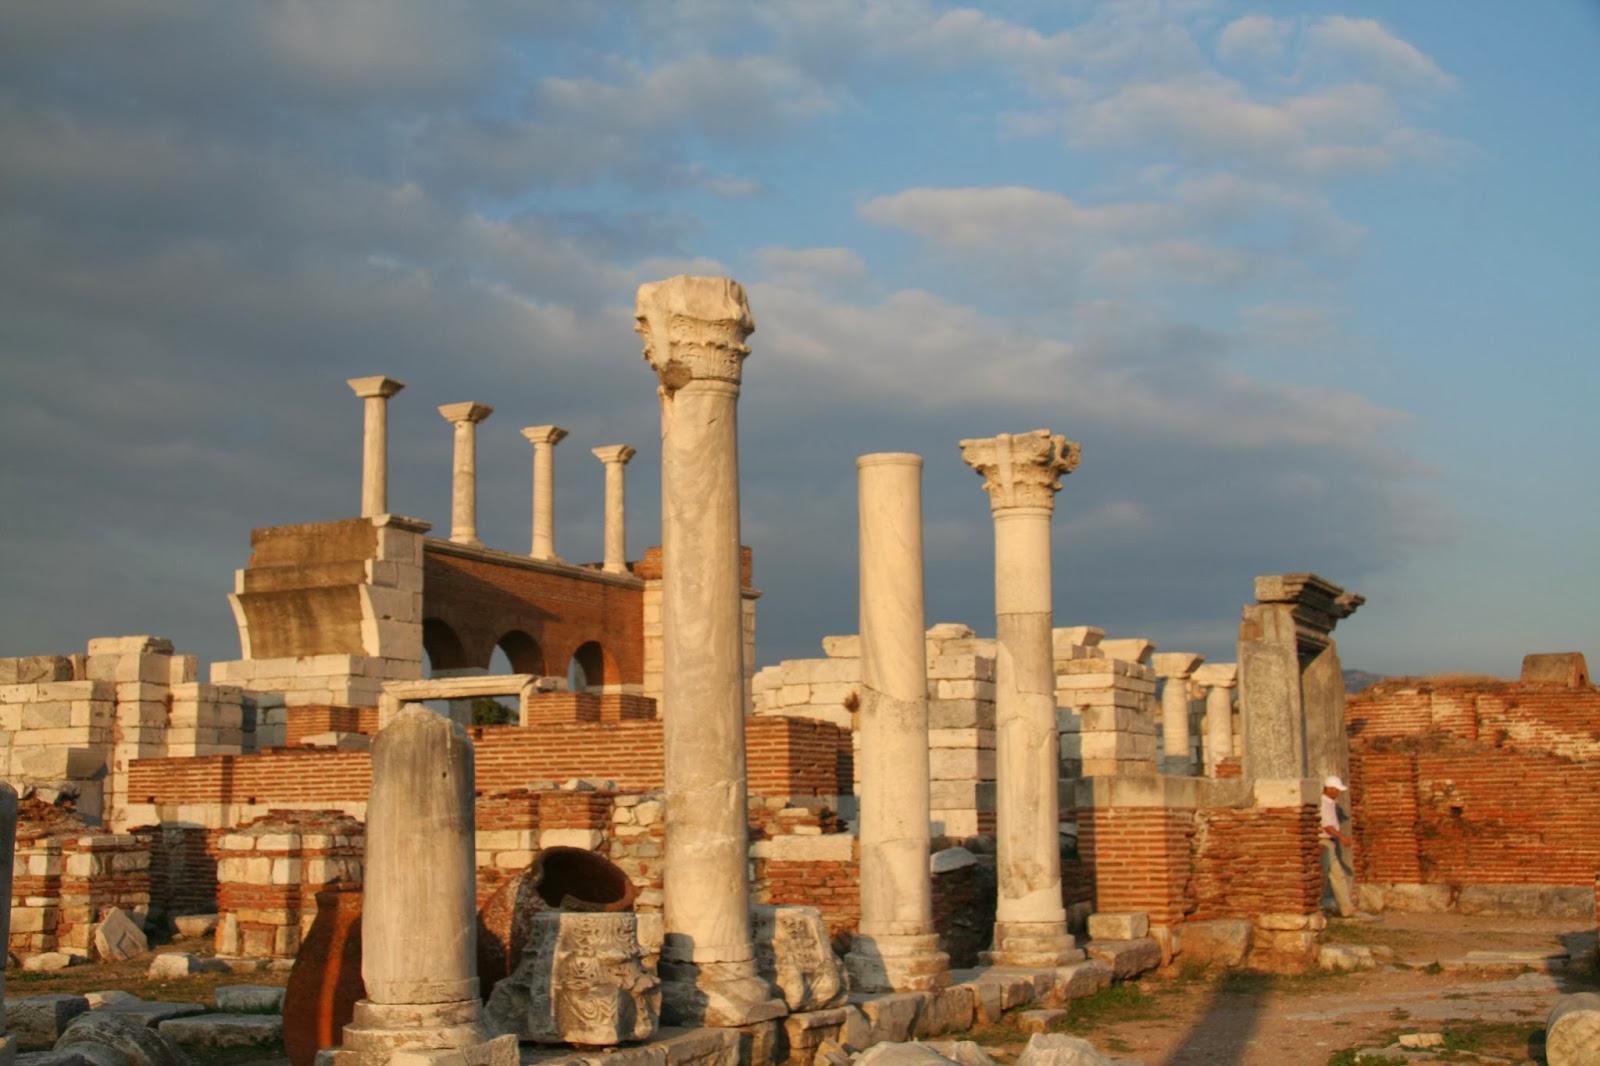 ruins-of-the-temple-of-artemis-at-ephesus